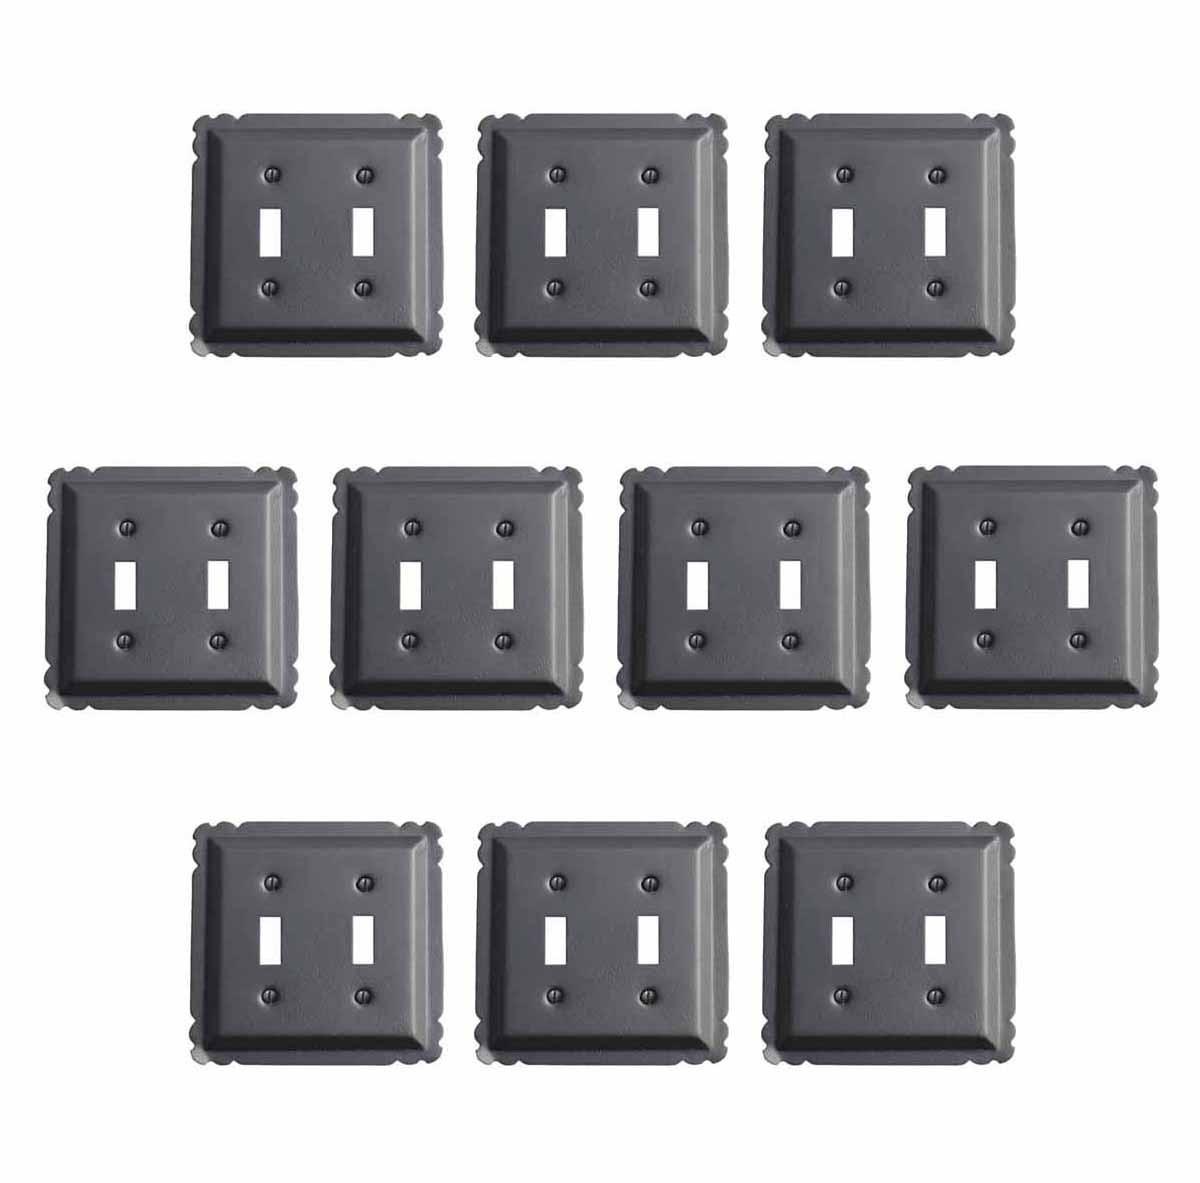 10 Switchplate Black Steel Double Toggle | Renovators Supply